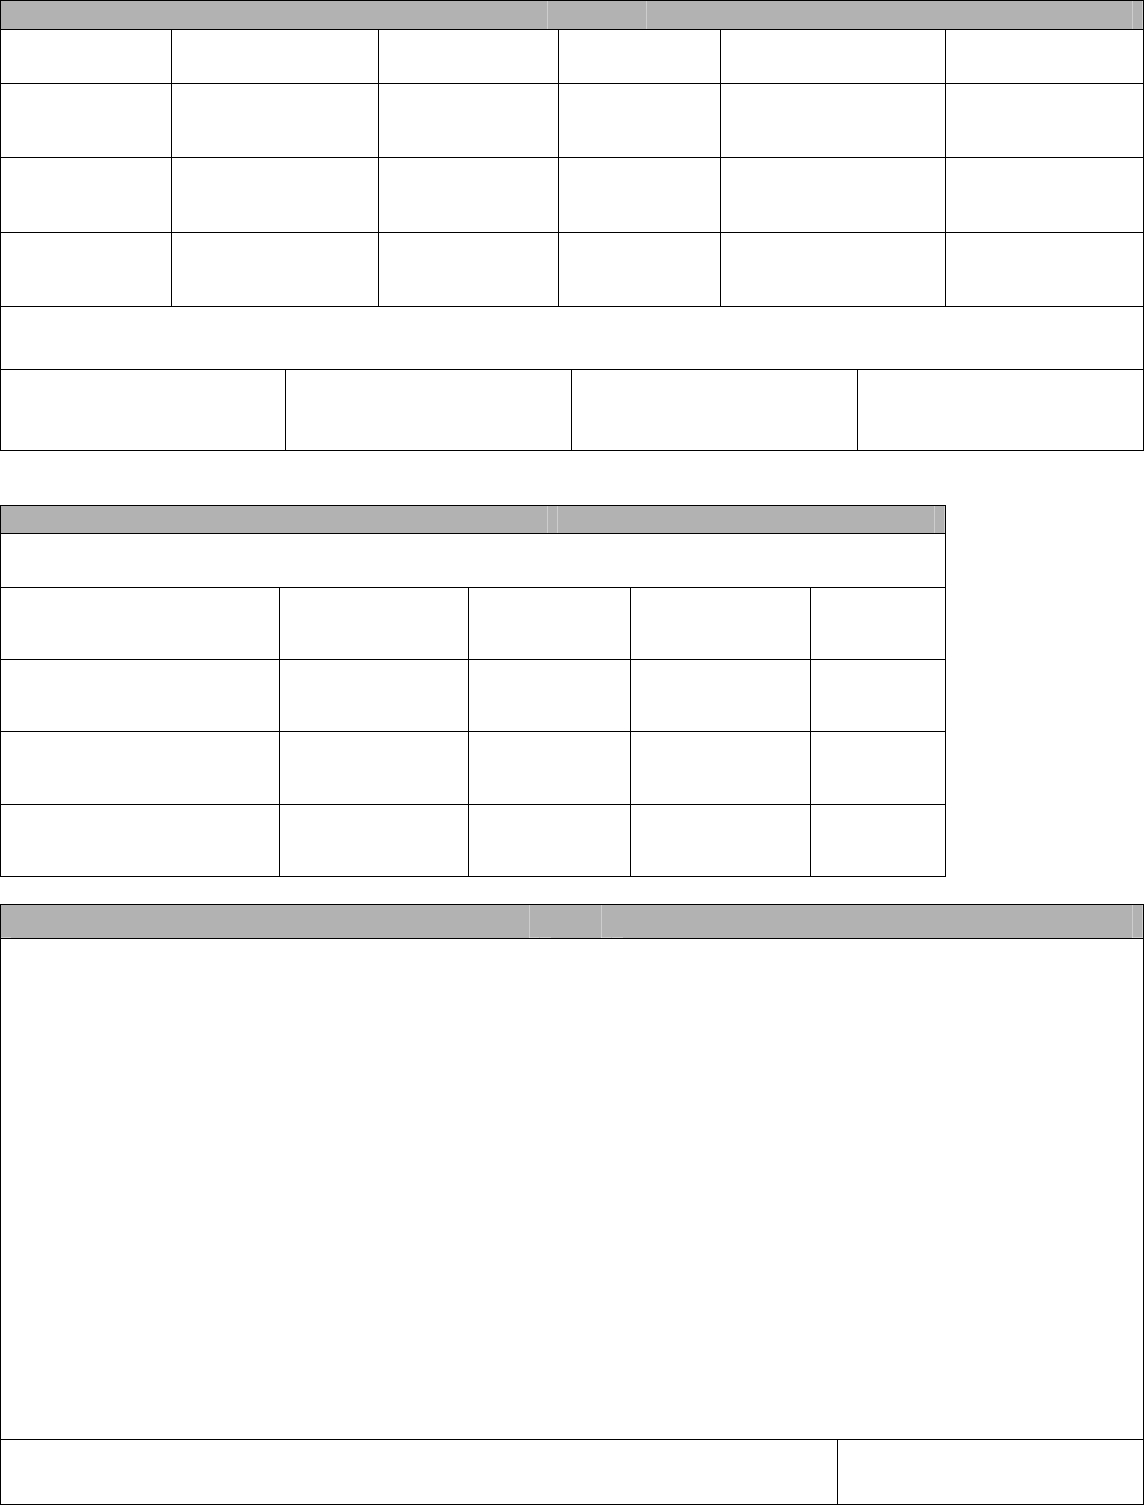 Free Printable Taco Bell Job Application Form Page 3 - Free Printable Taco Bell Application